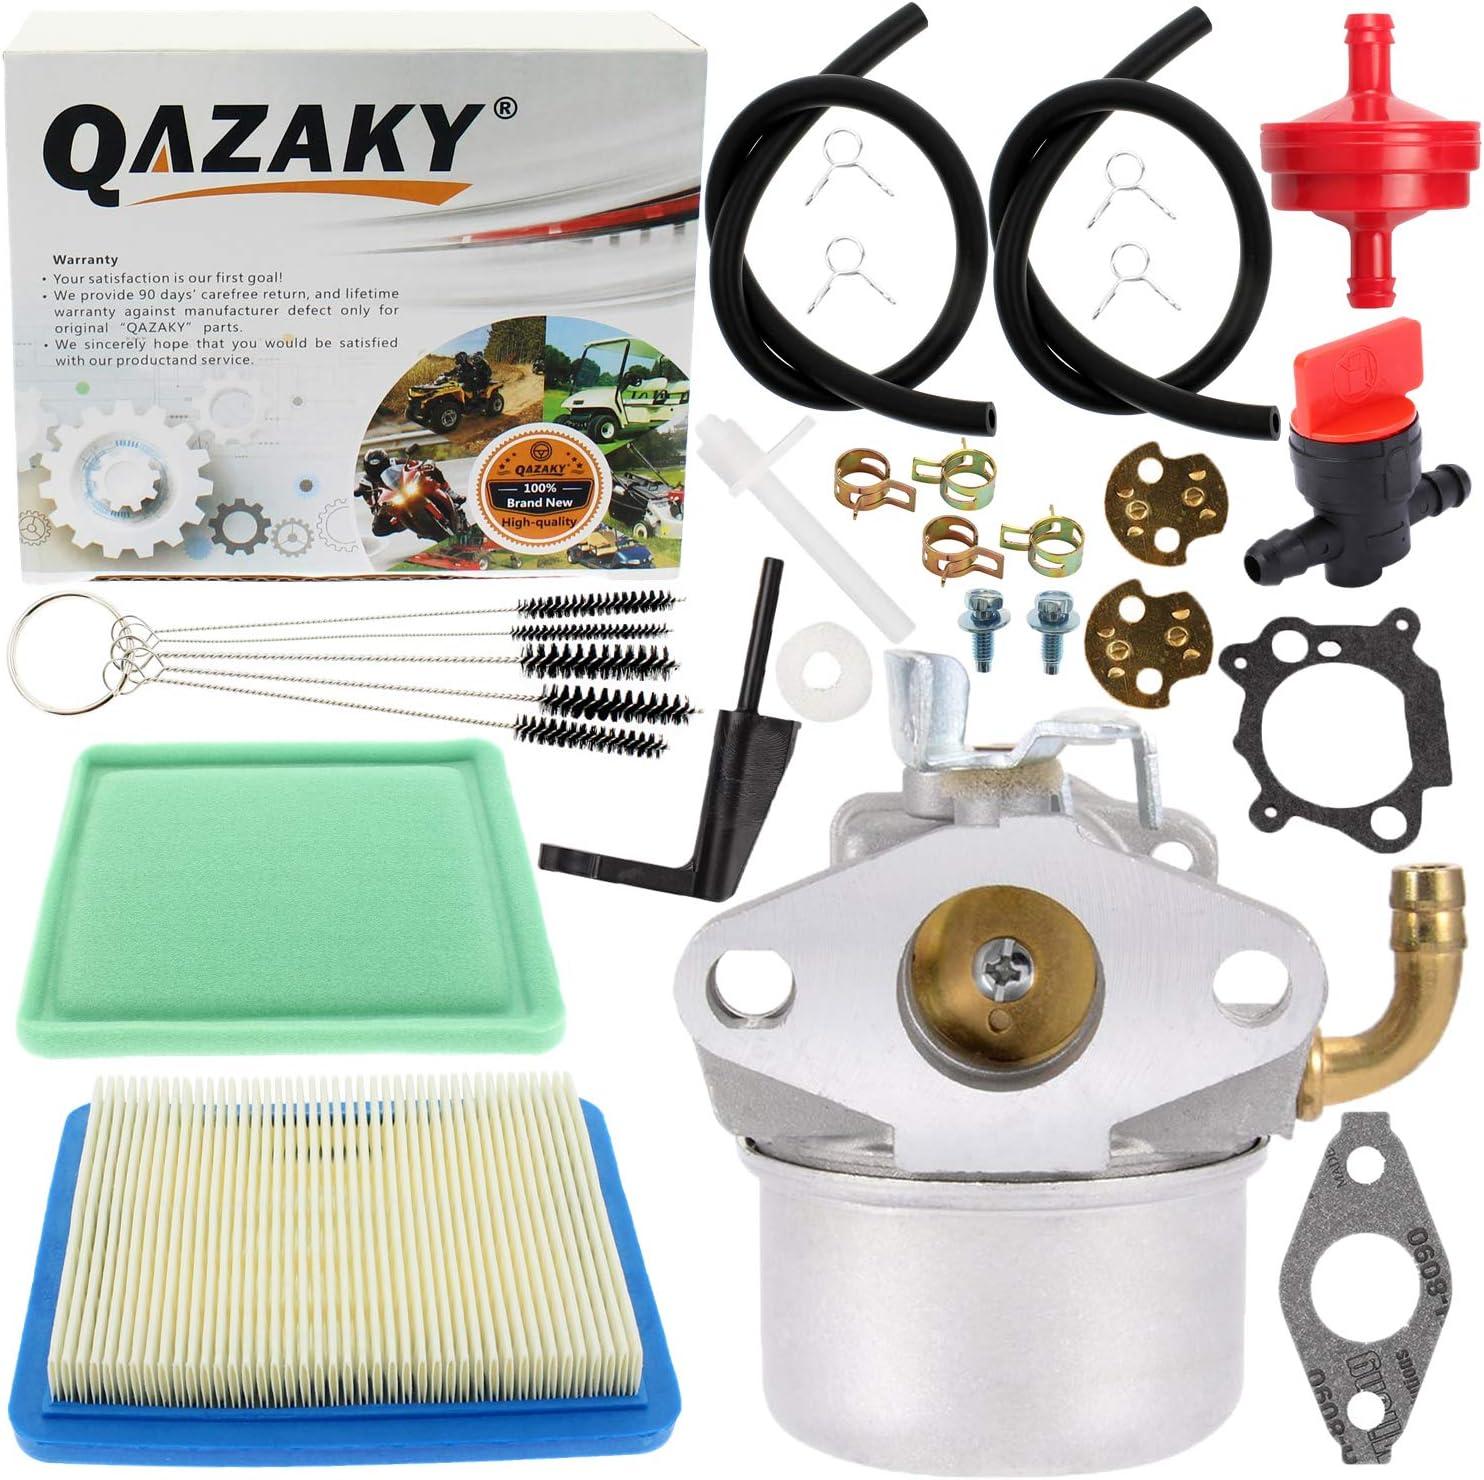 QAZAKY Carburetor Replacement for Briggs & Stratton 121012 121212 121232 121237 121252 121312 121332 121412 121415 121432 122012 124432 126302 126312 126317 126332 126352 126392 126402 126412 126415